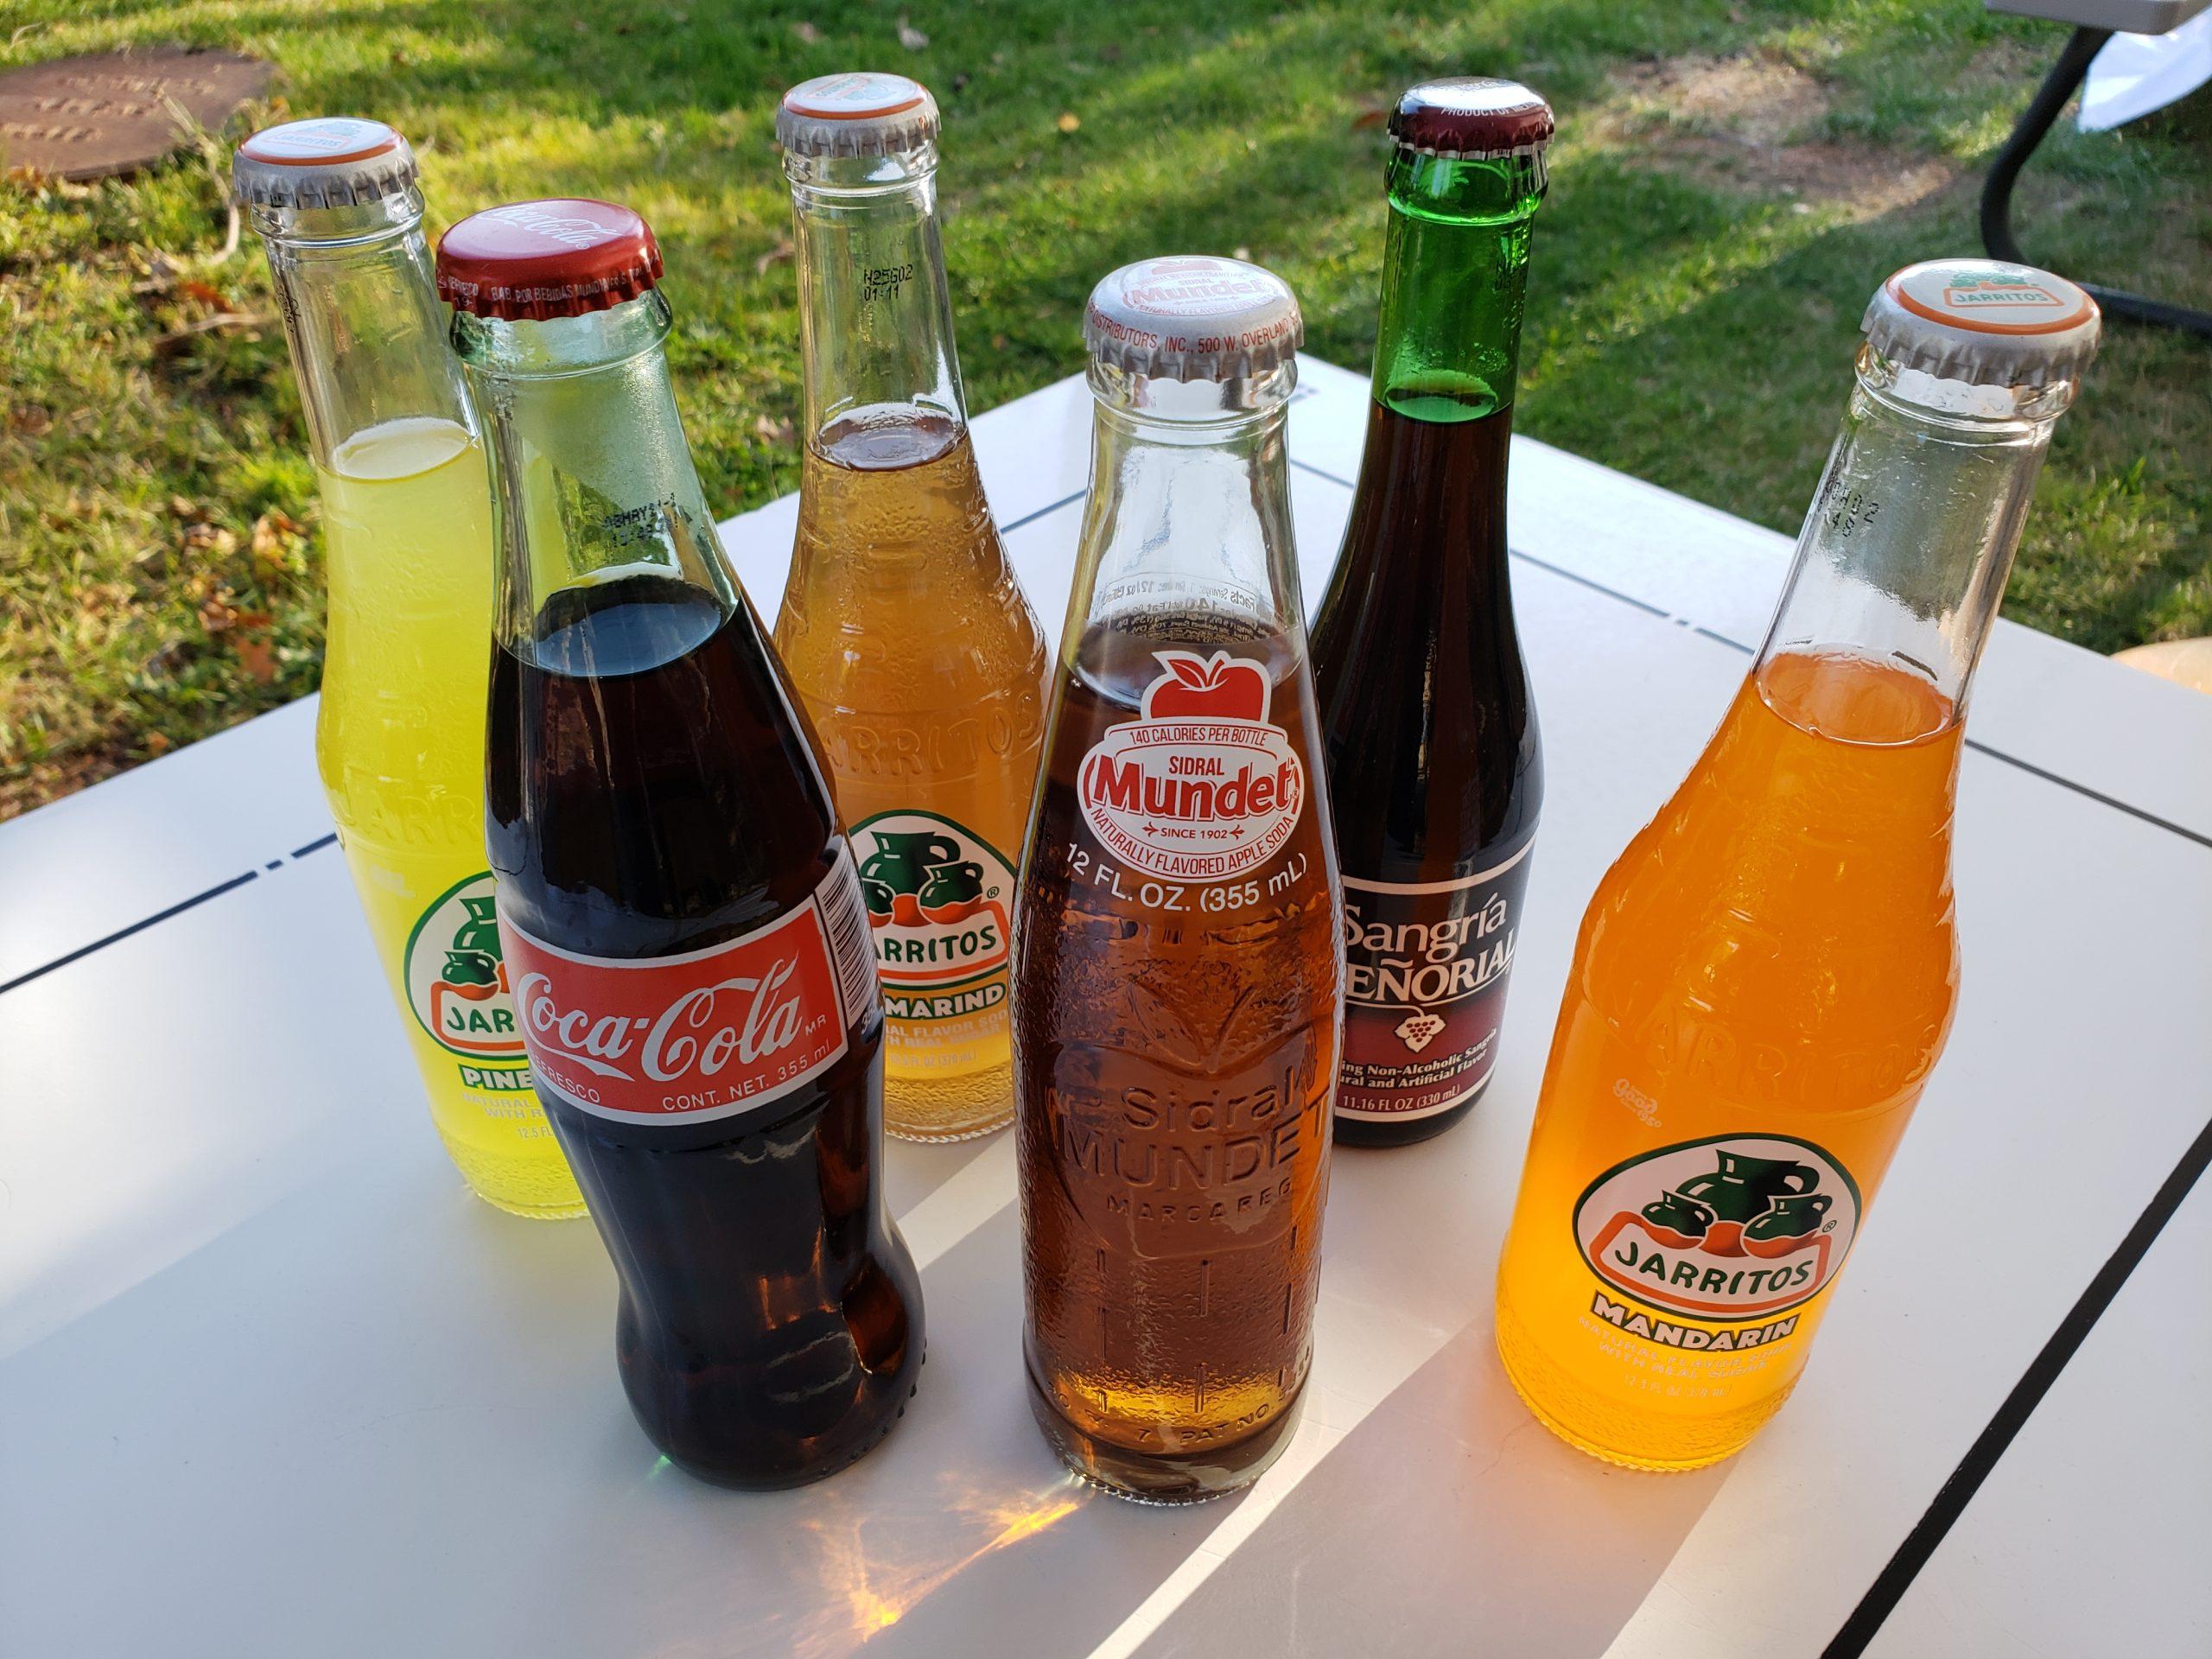 Country Dream soda